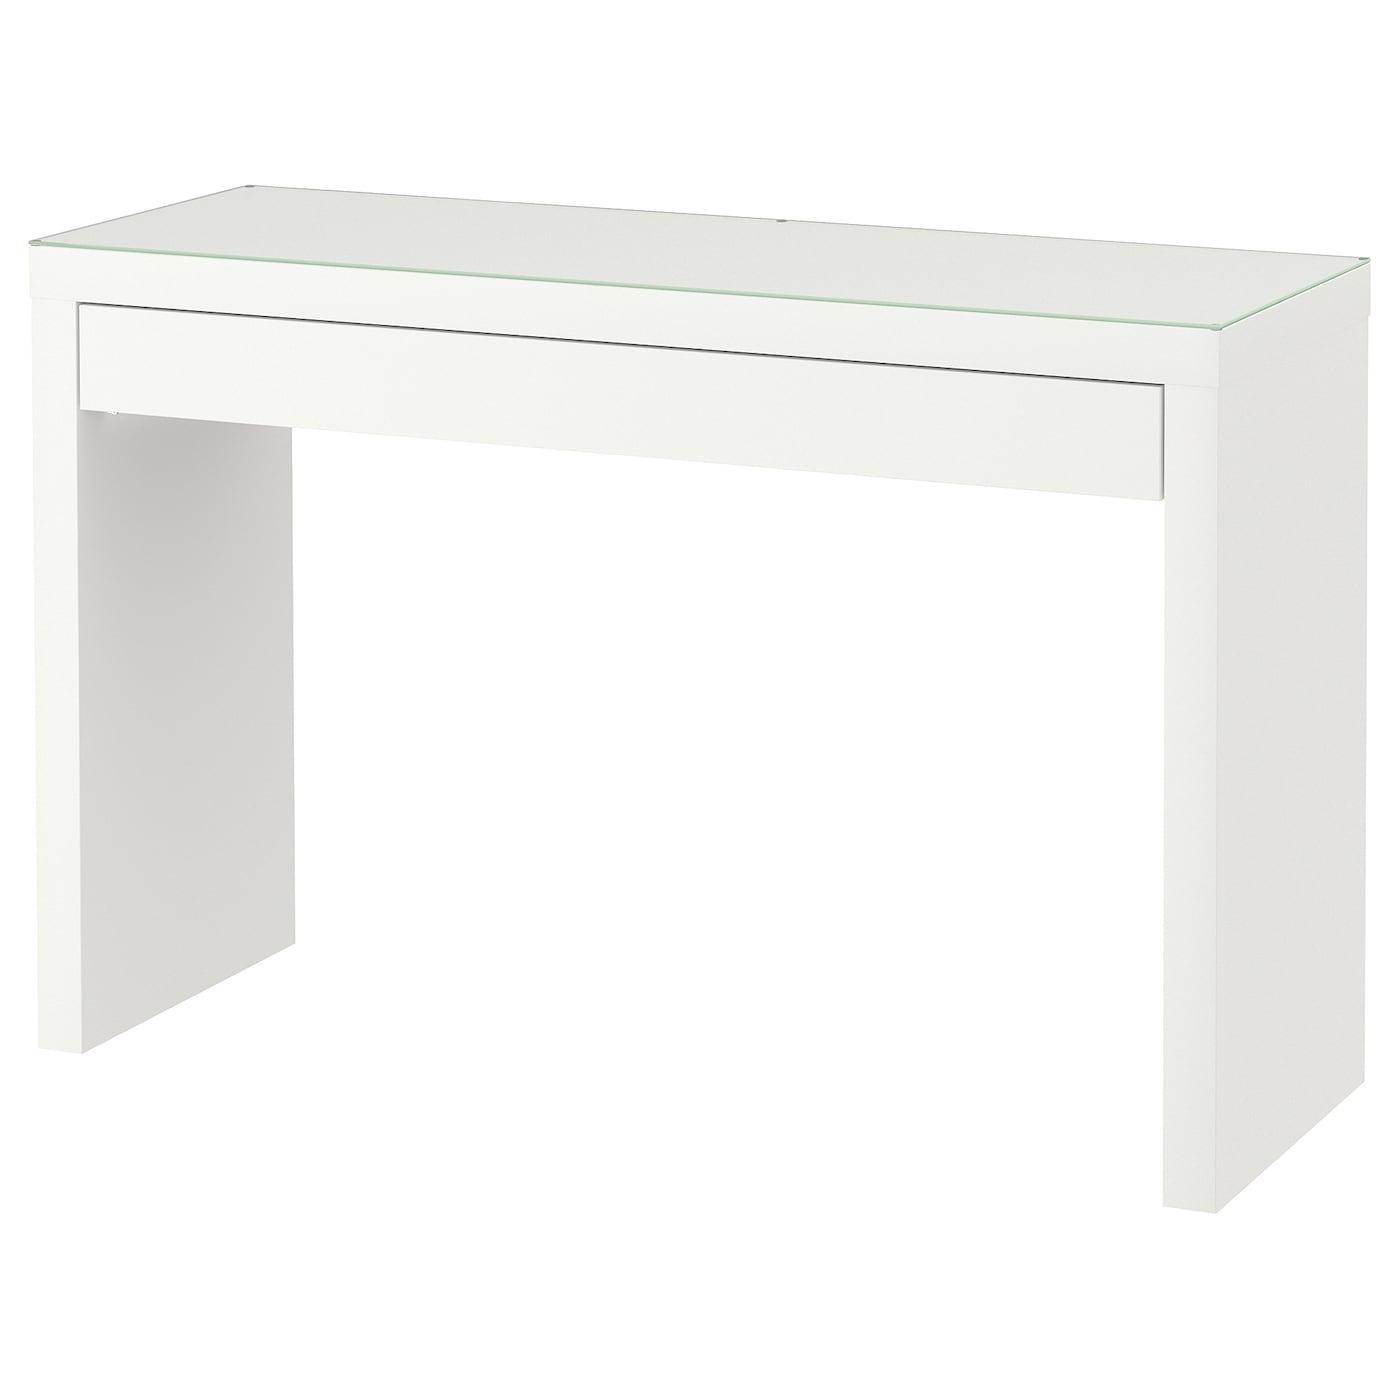 Moderne Witte Kaptafel.Toilettafel Slaapkamer Ikea